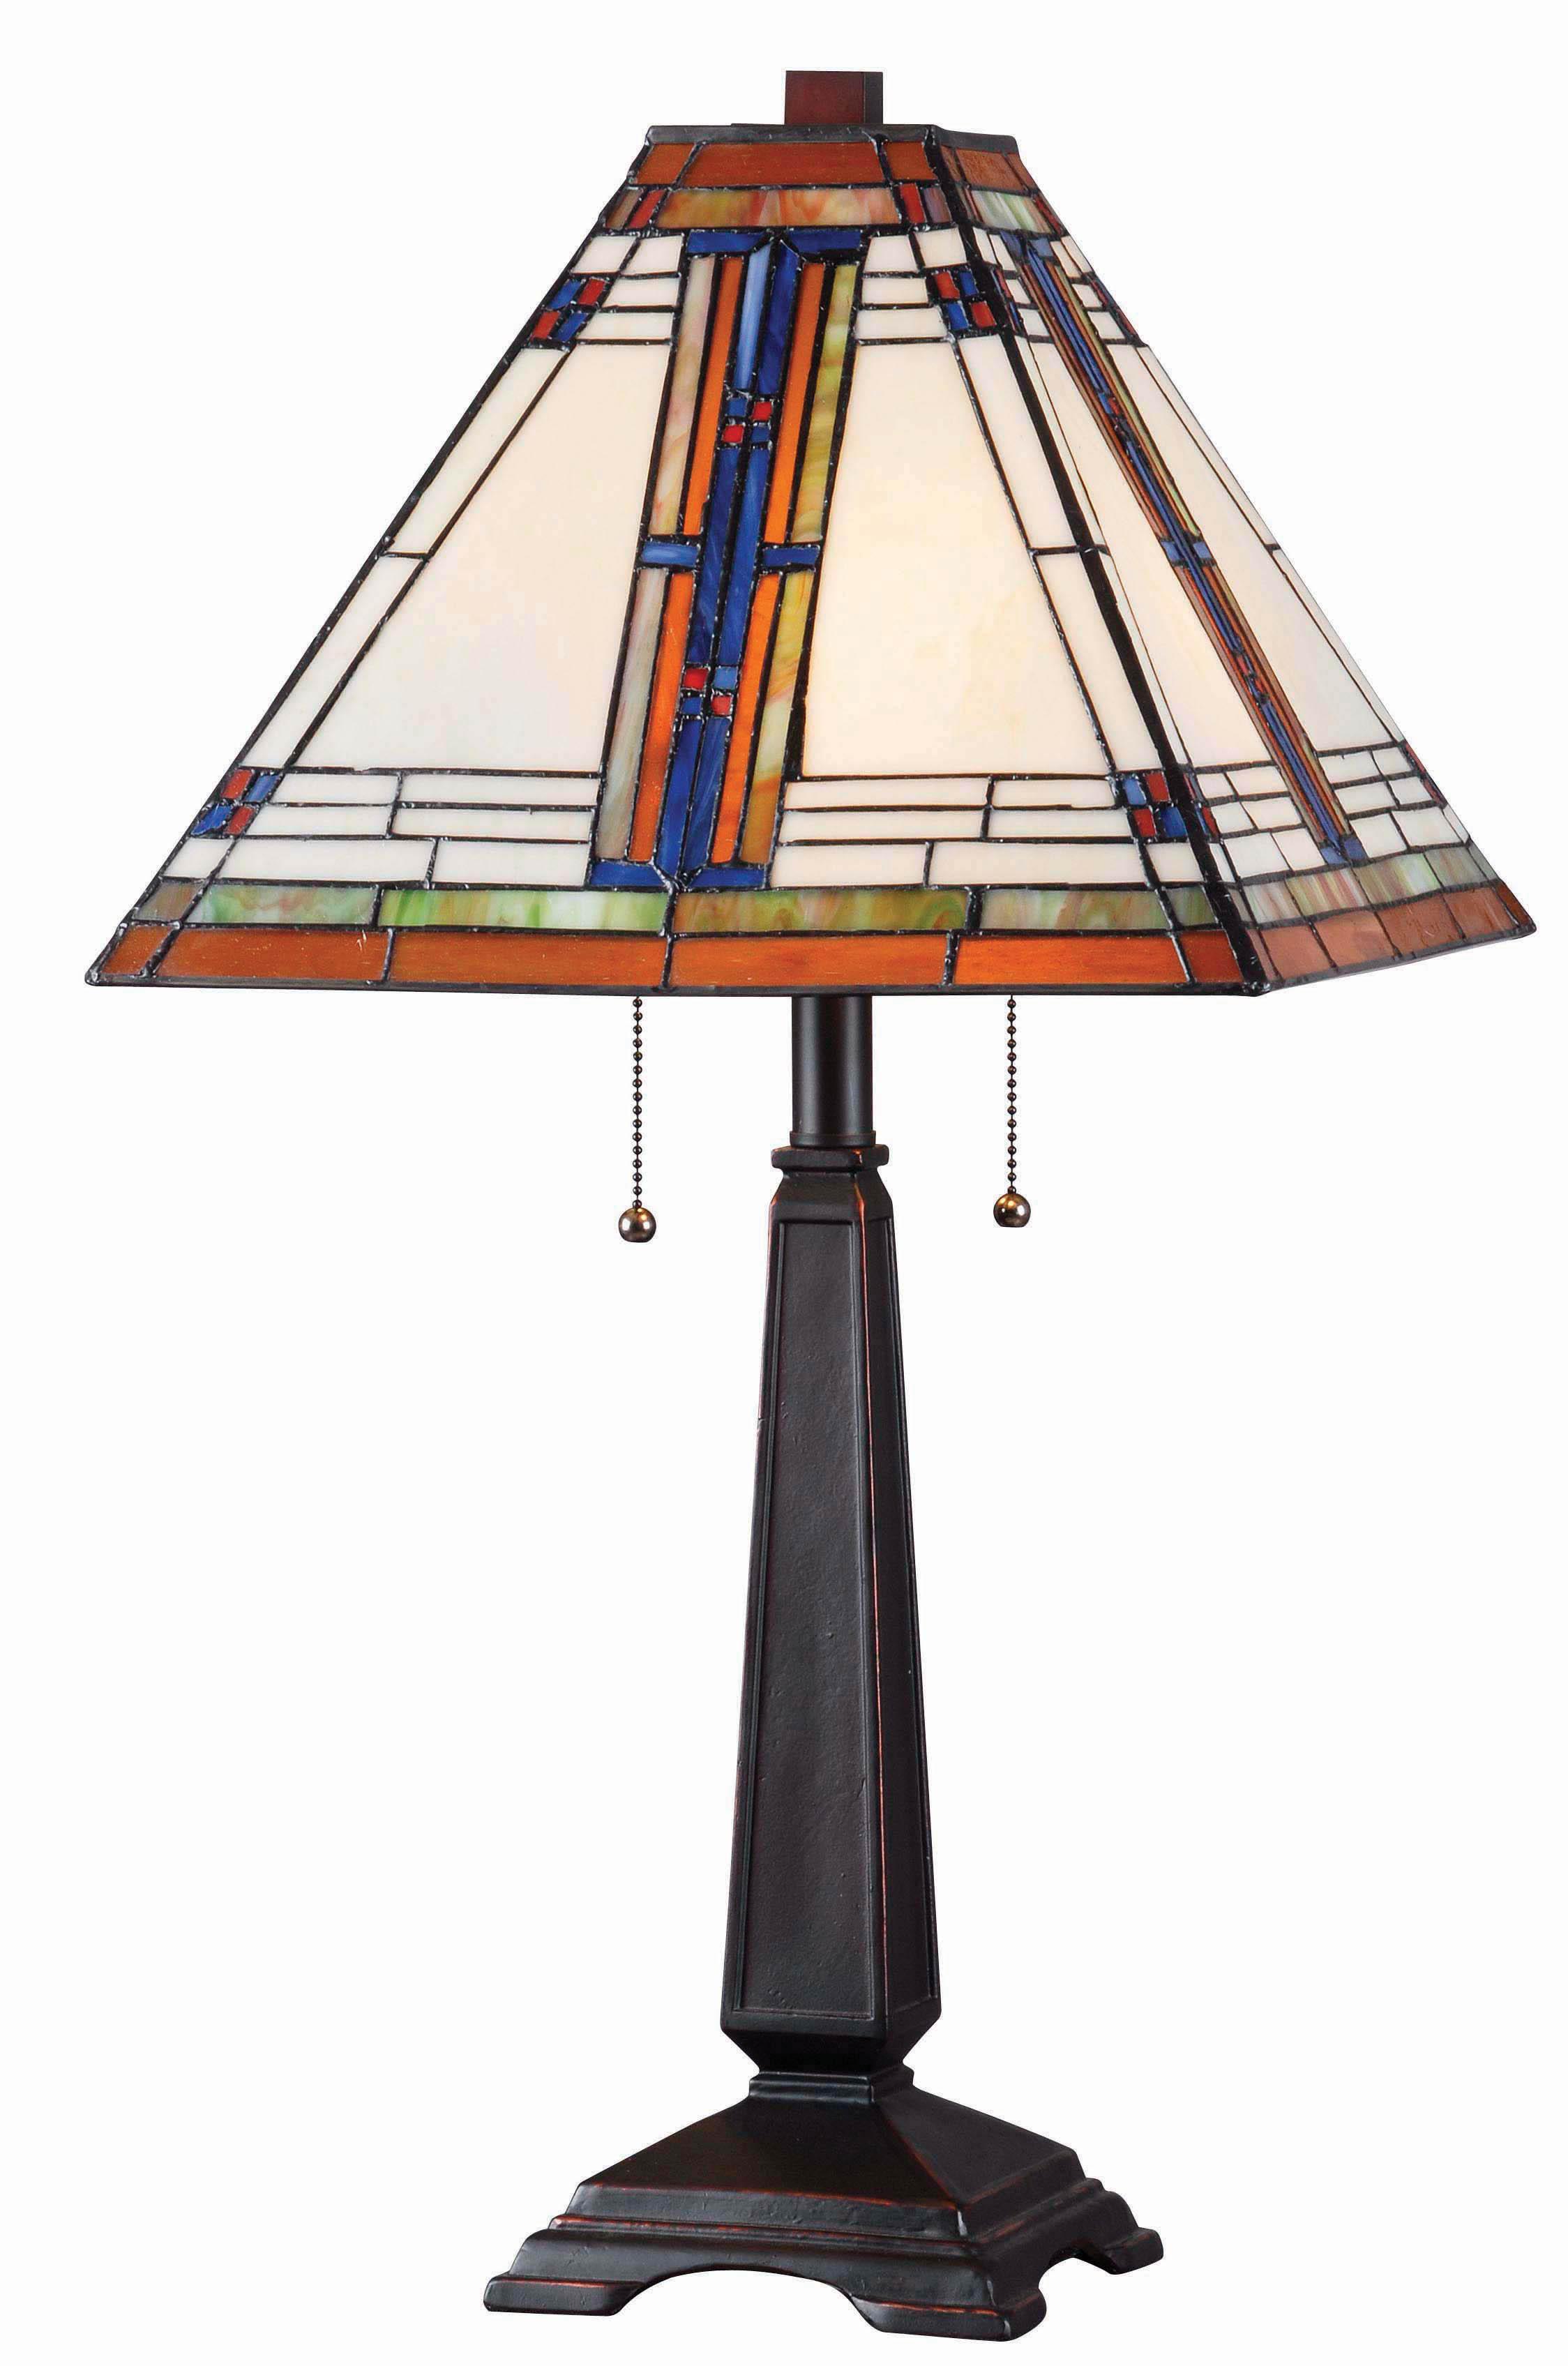 Kenroy Pratt lamp 32286ORB.jpg